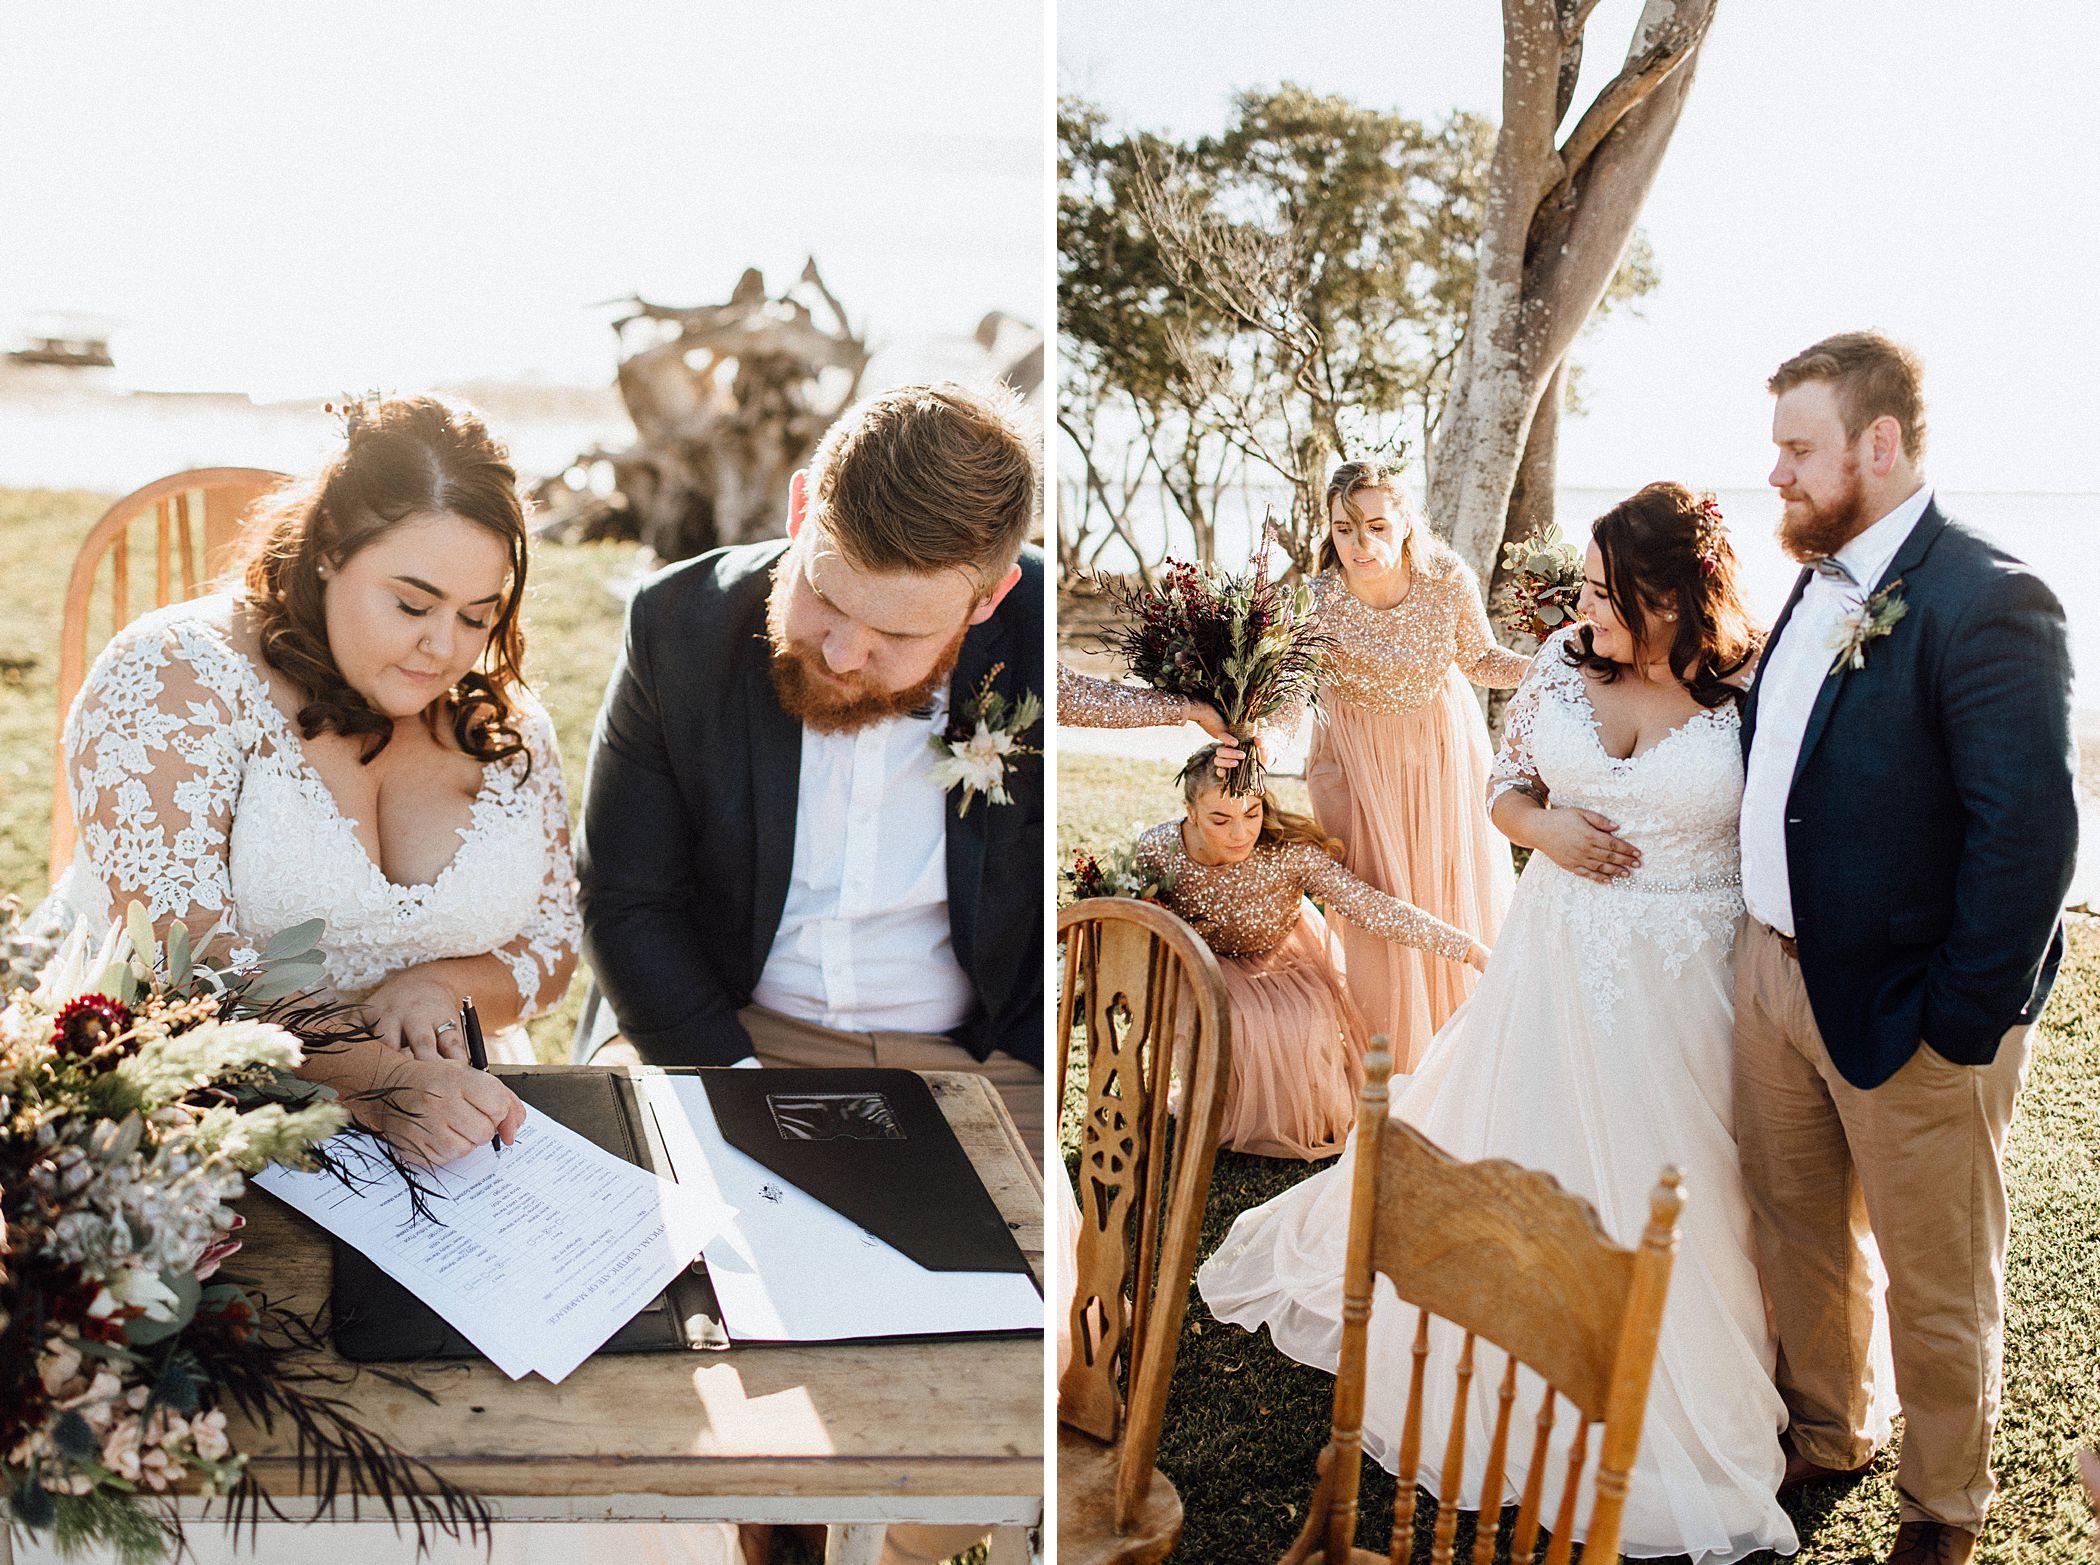 lauren-anne-photography-newcastle-hunter-valley-wedding-photographer_1187.jpg